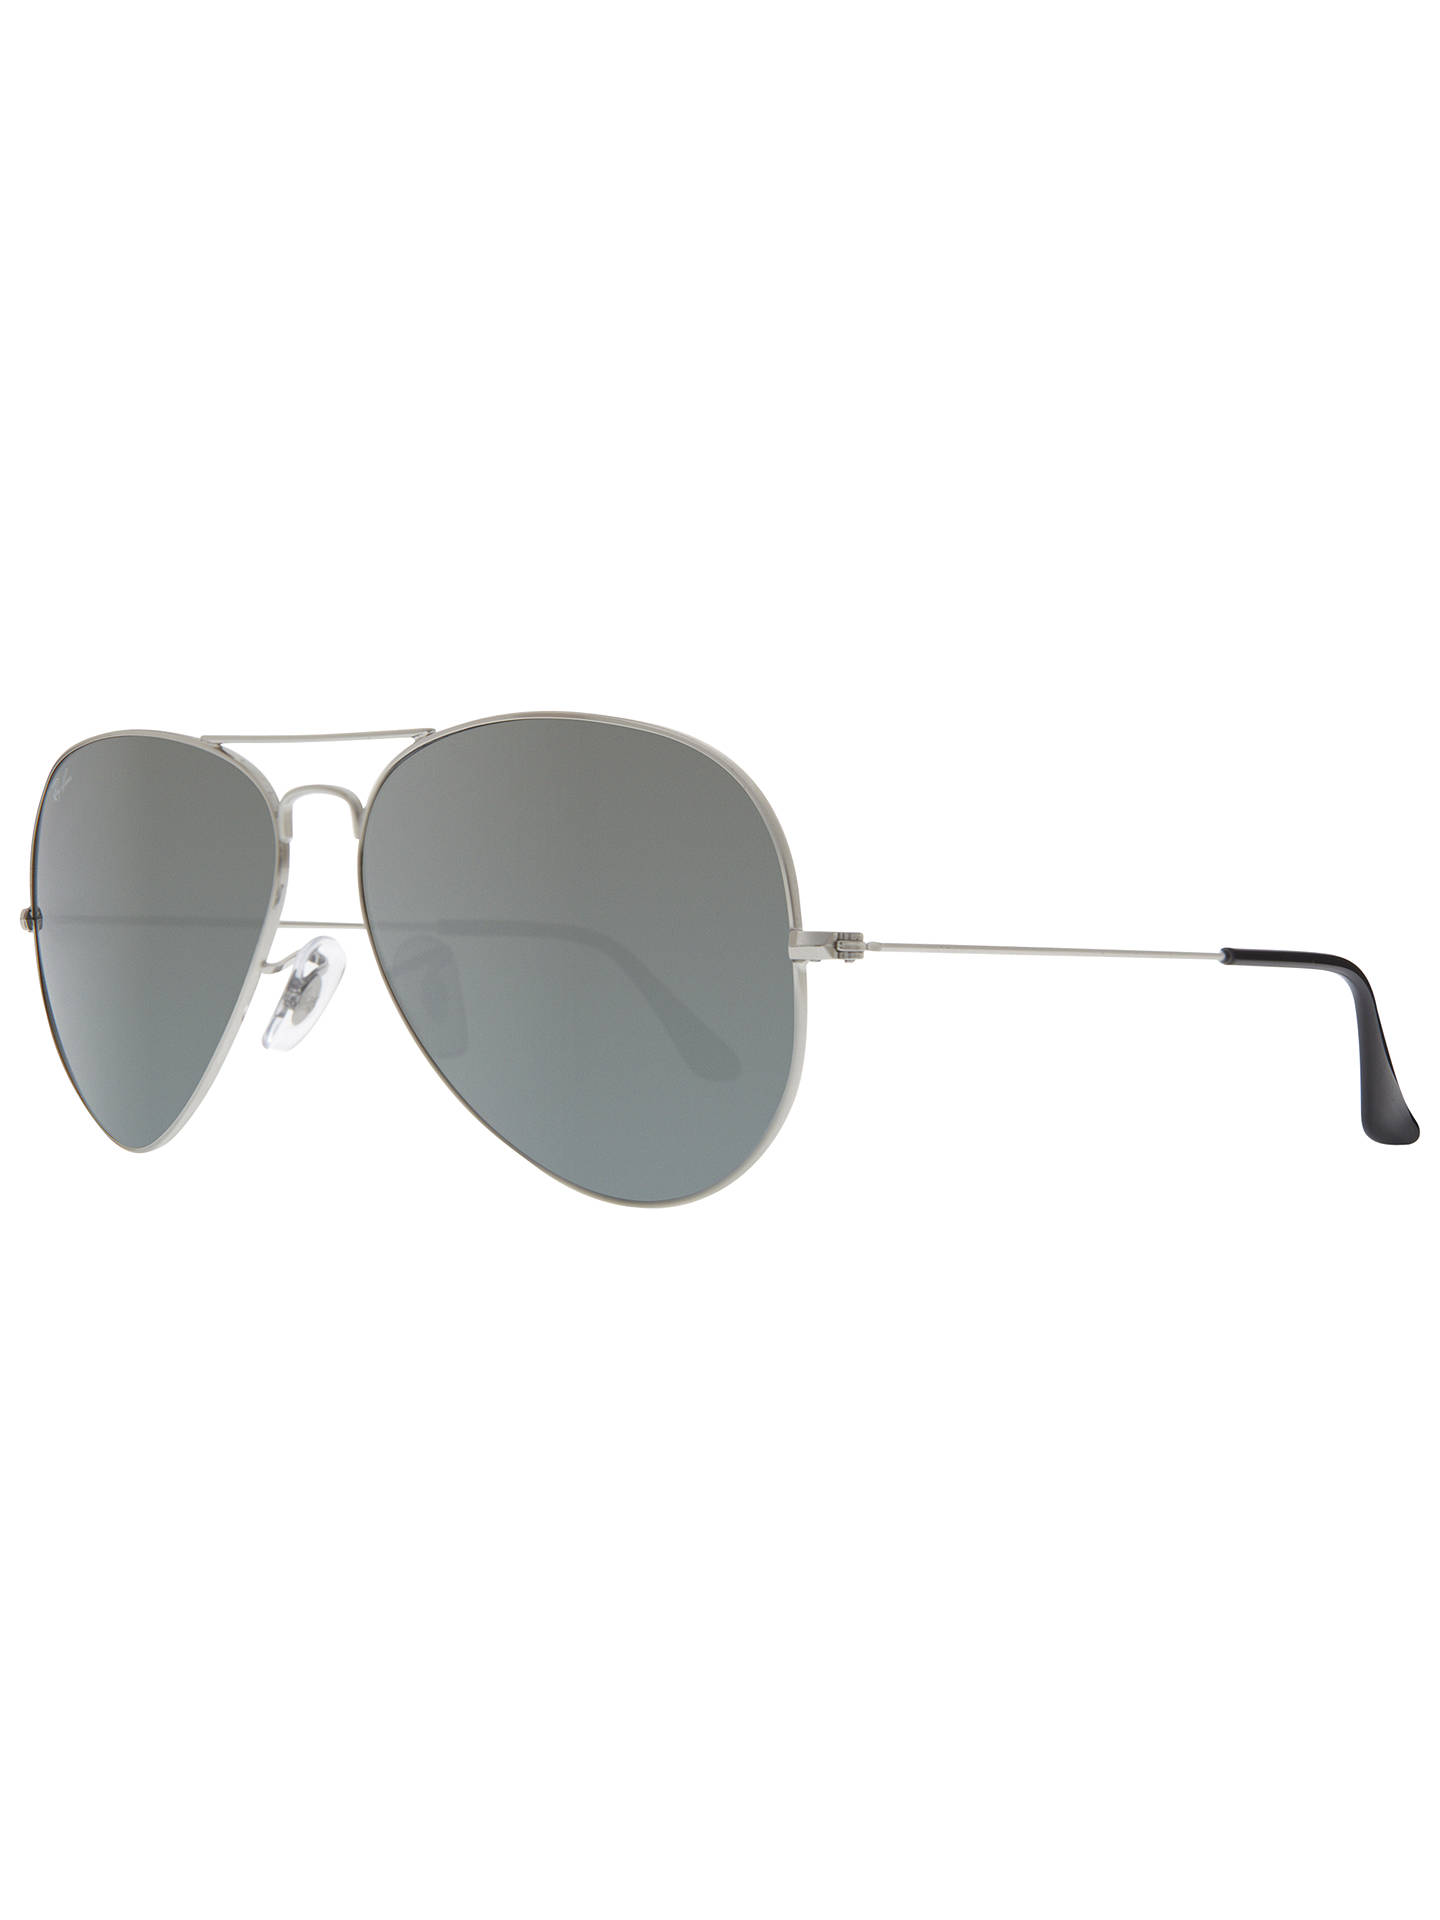 82a3f860ff4ed Buy Ray-Ban RB3025 Aviator Sunglasses